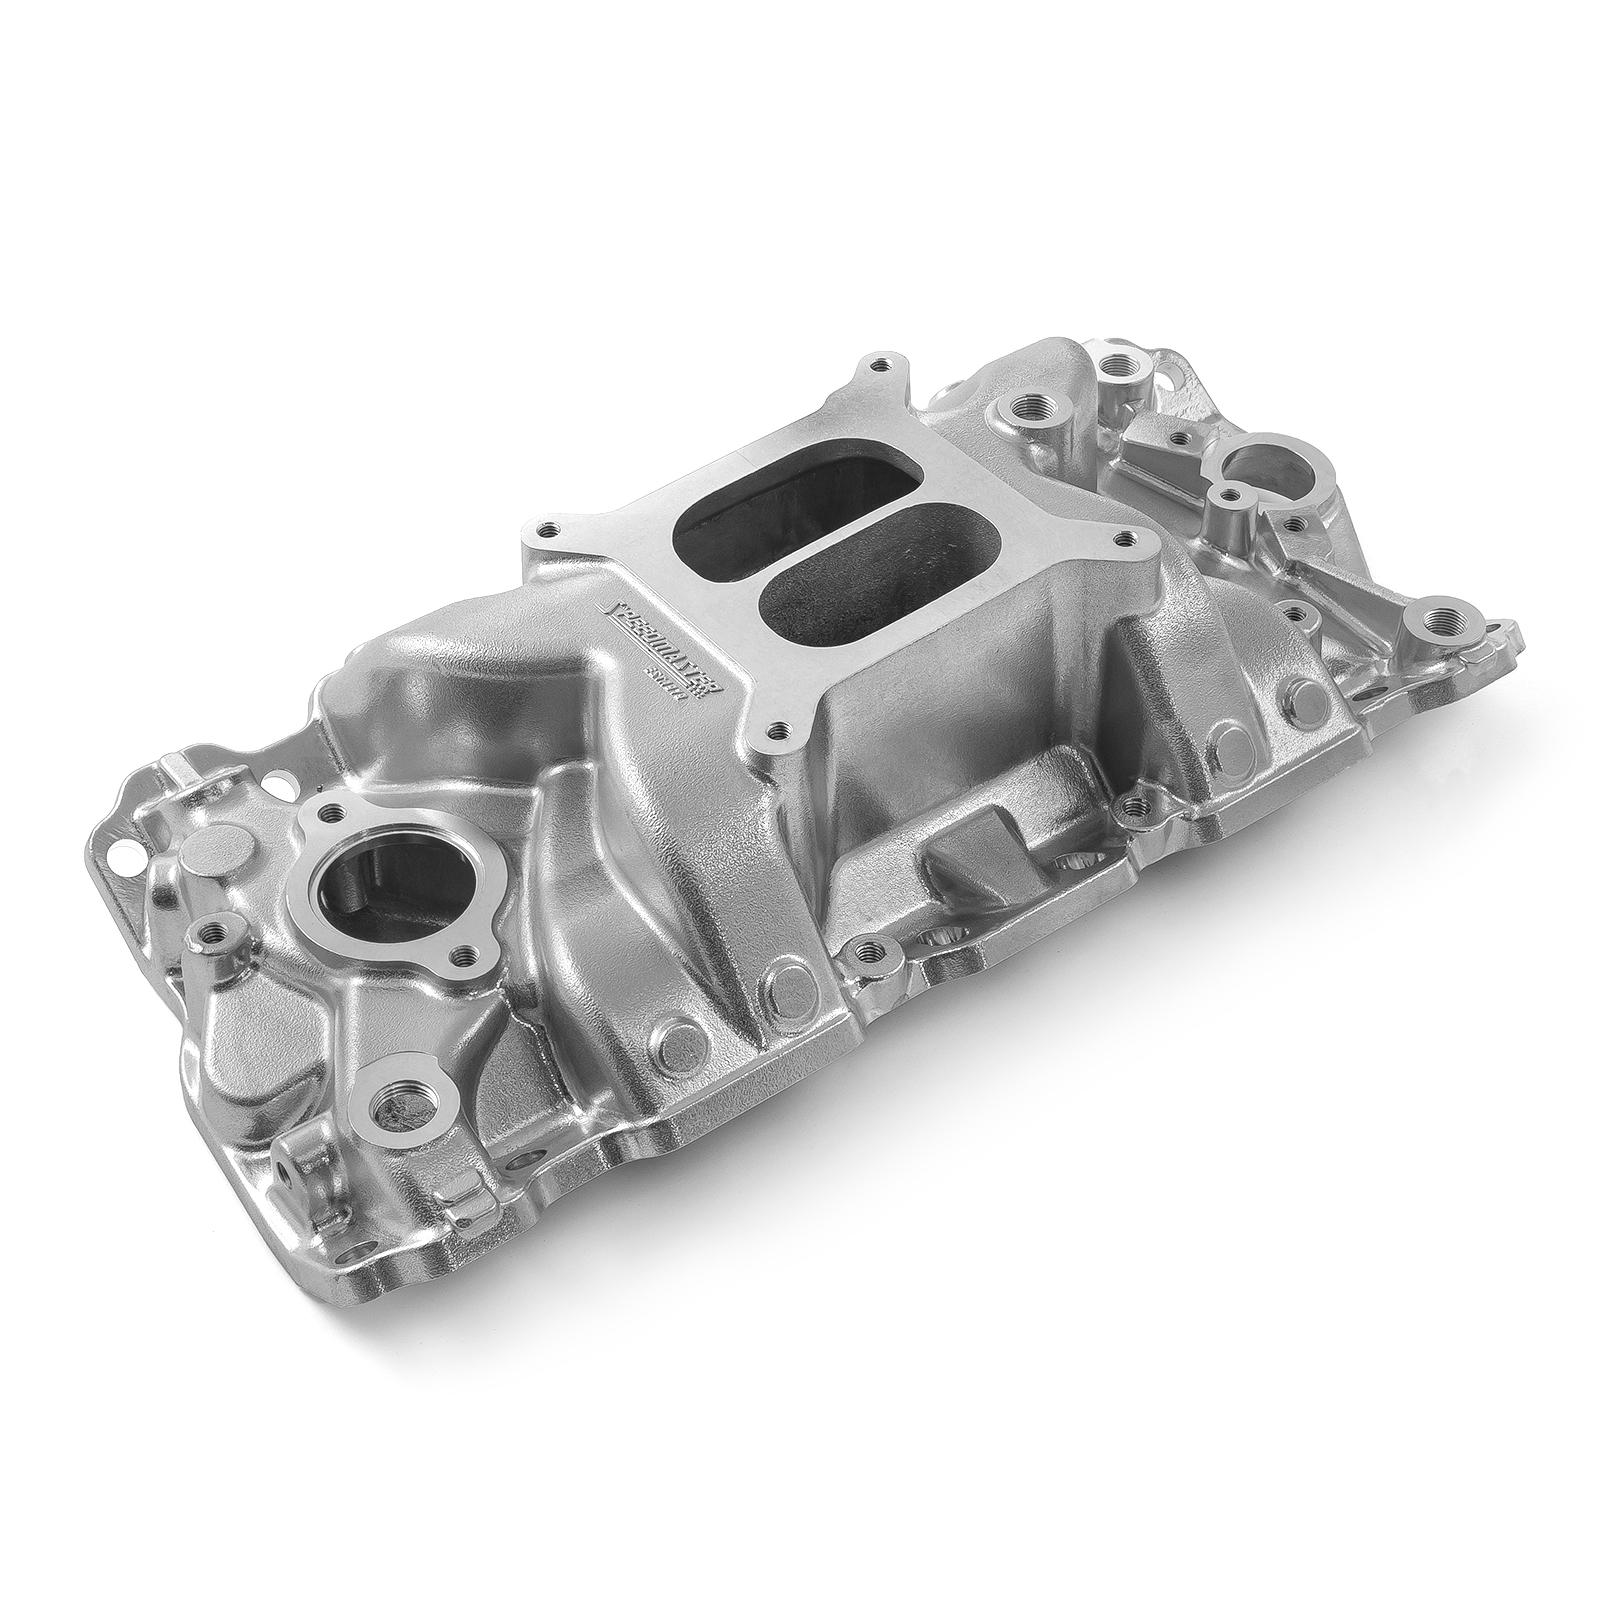 Chevy SBC 350 MidRise Aluminum Intake Manifold Machine Polished